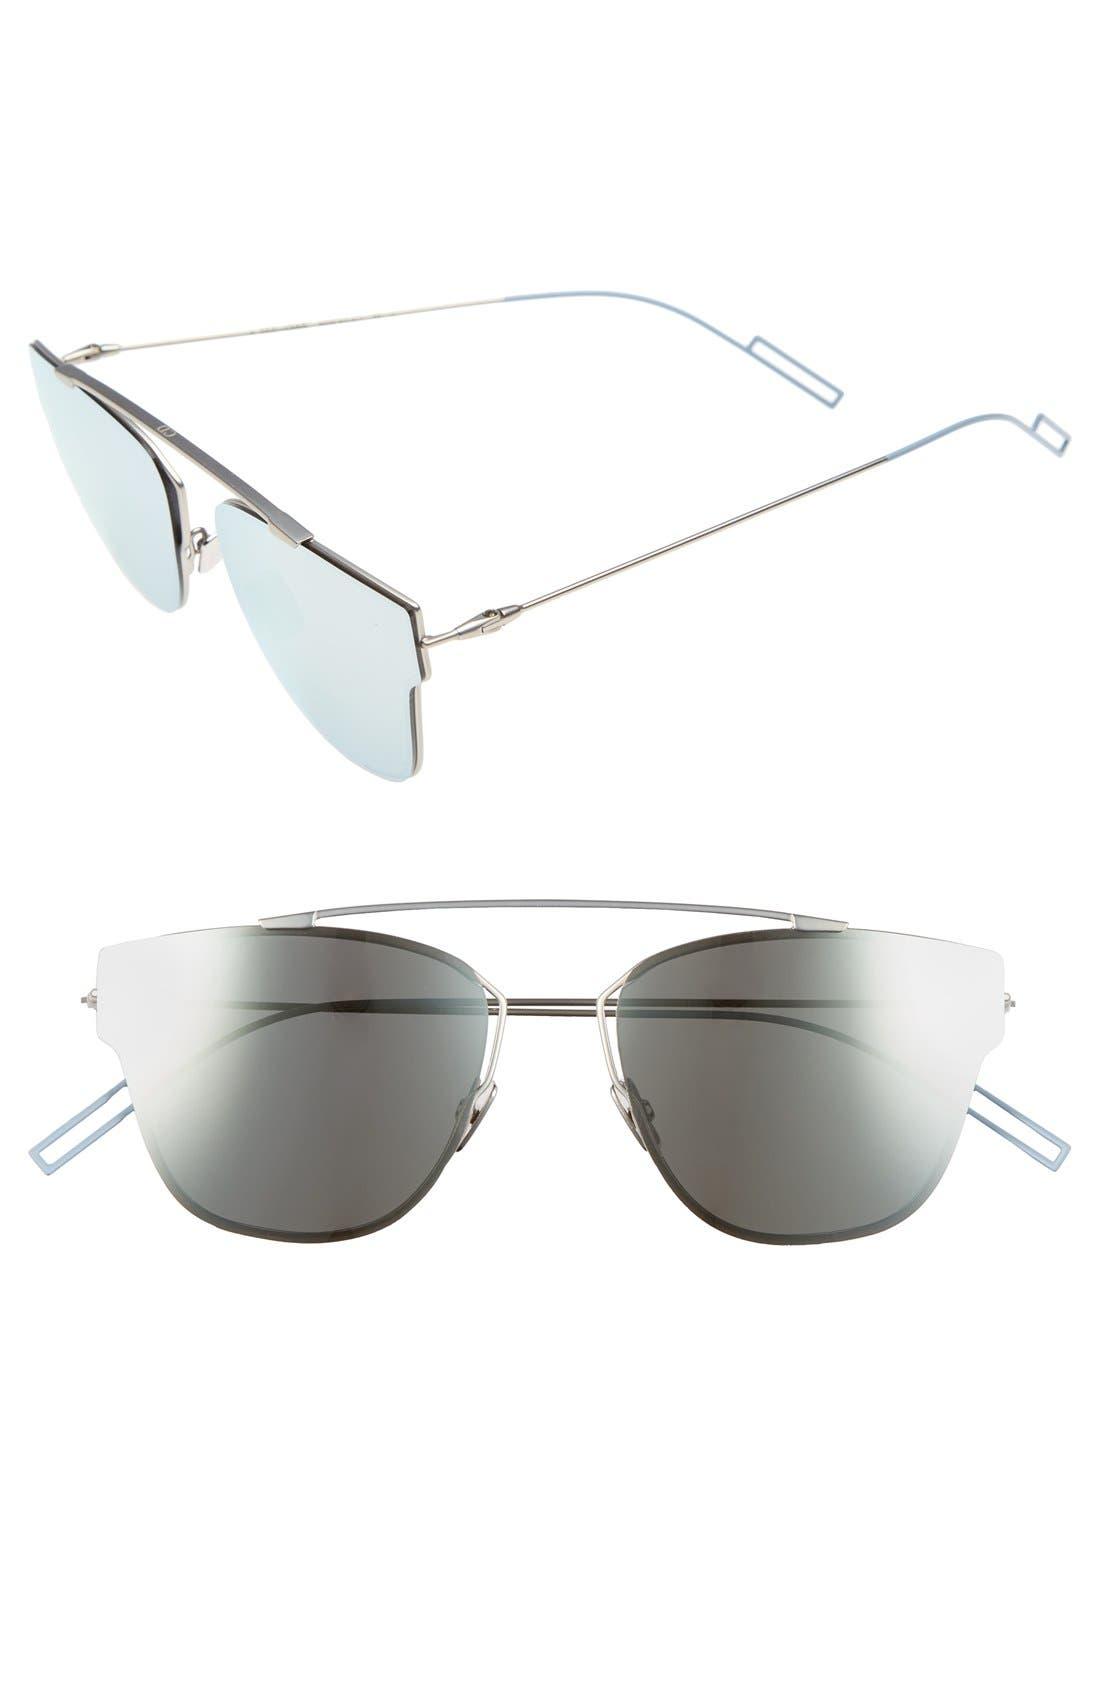 57mm Semi Rimless Sunglasses,                         Main,                         color, 020